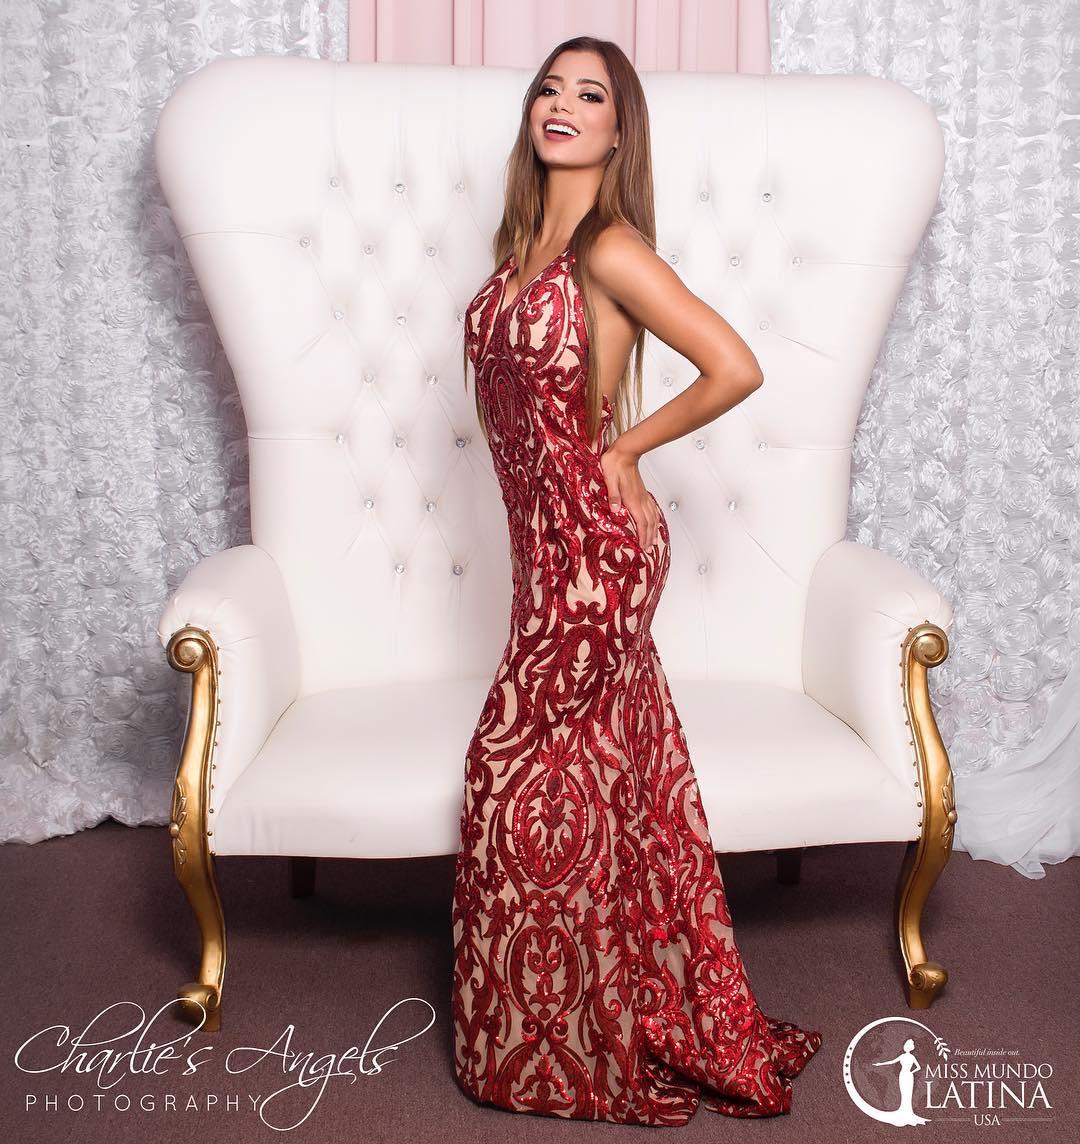 geraldine chaparro, miss usa hispanoamericana 2018/miss mundo latina turismo usa 2018. 41812810